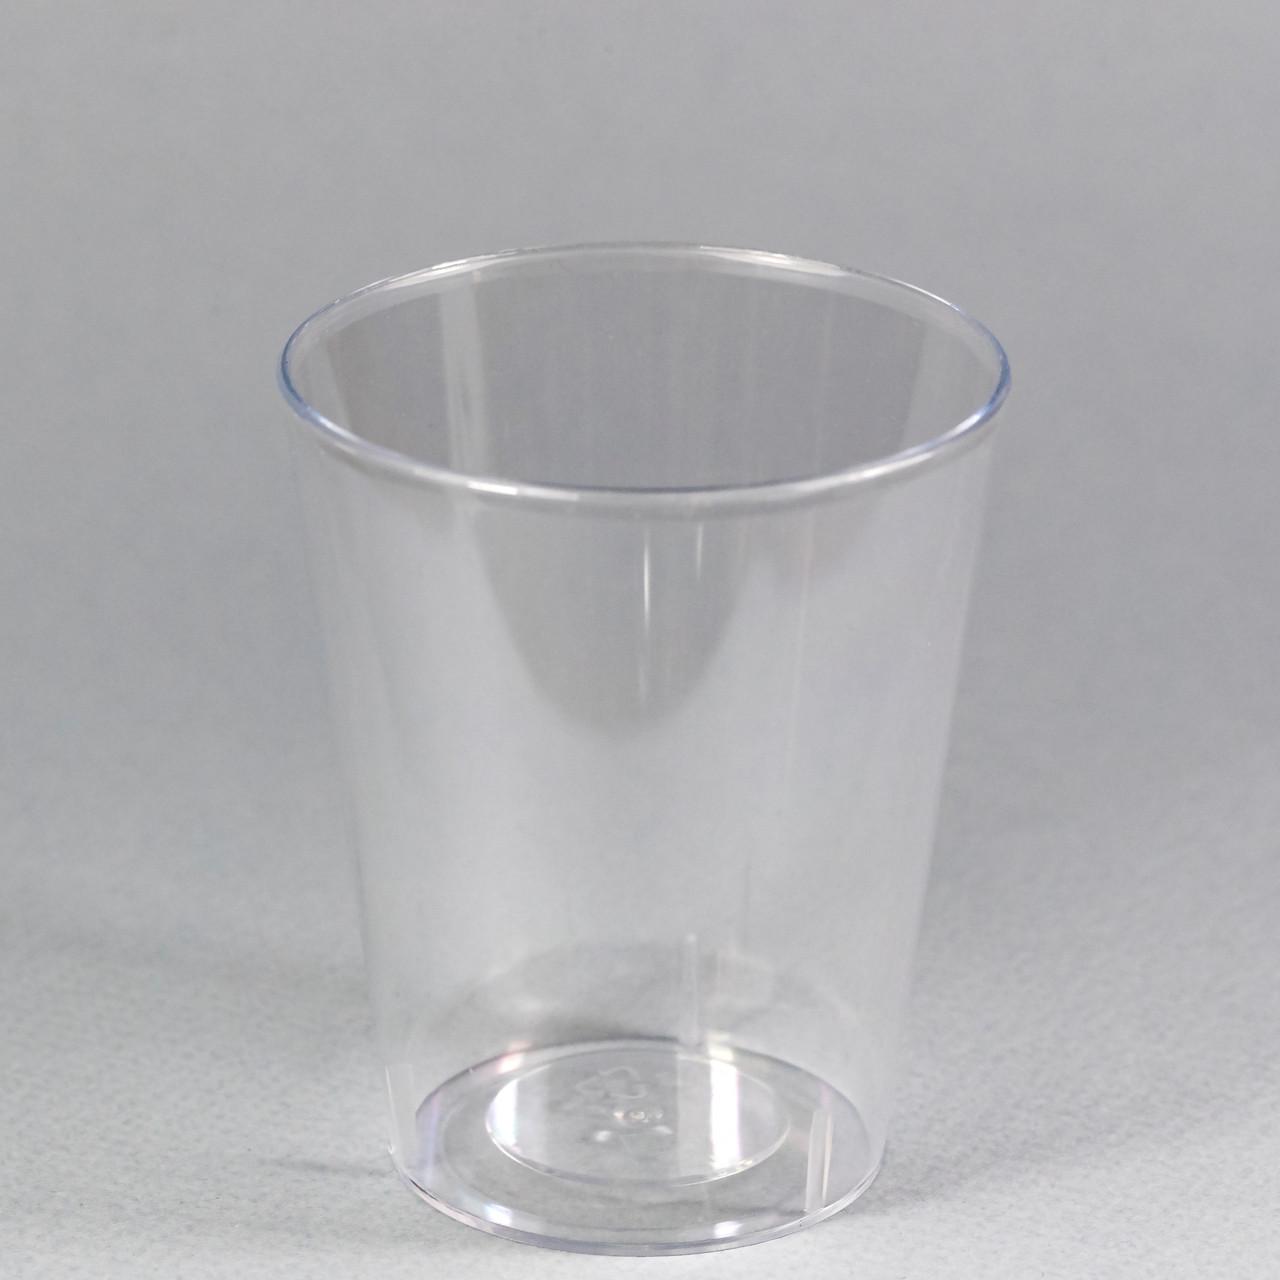 "Пиала фуршетная круглая 175 мл., 6,5х7,8 см., 25 шт/уп стеклоподобная, прозрачная ""Конус"""